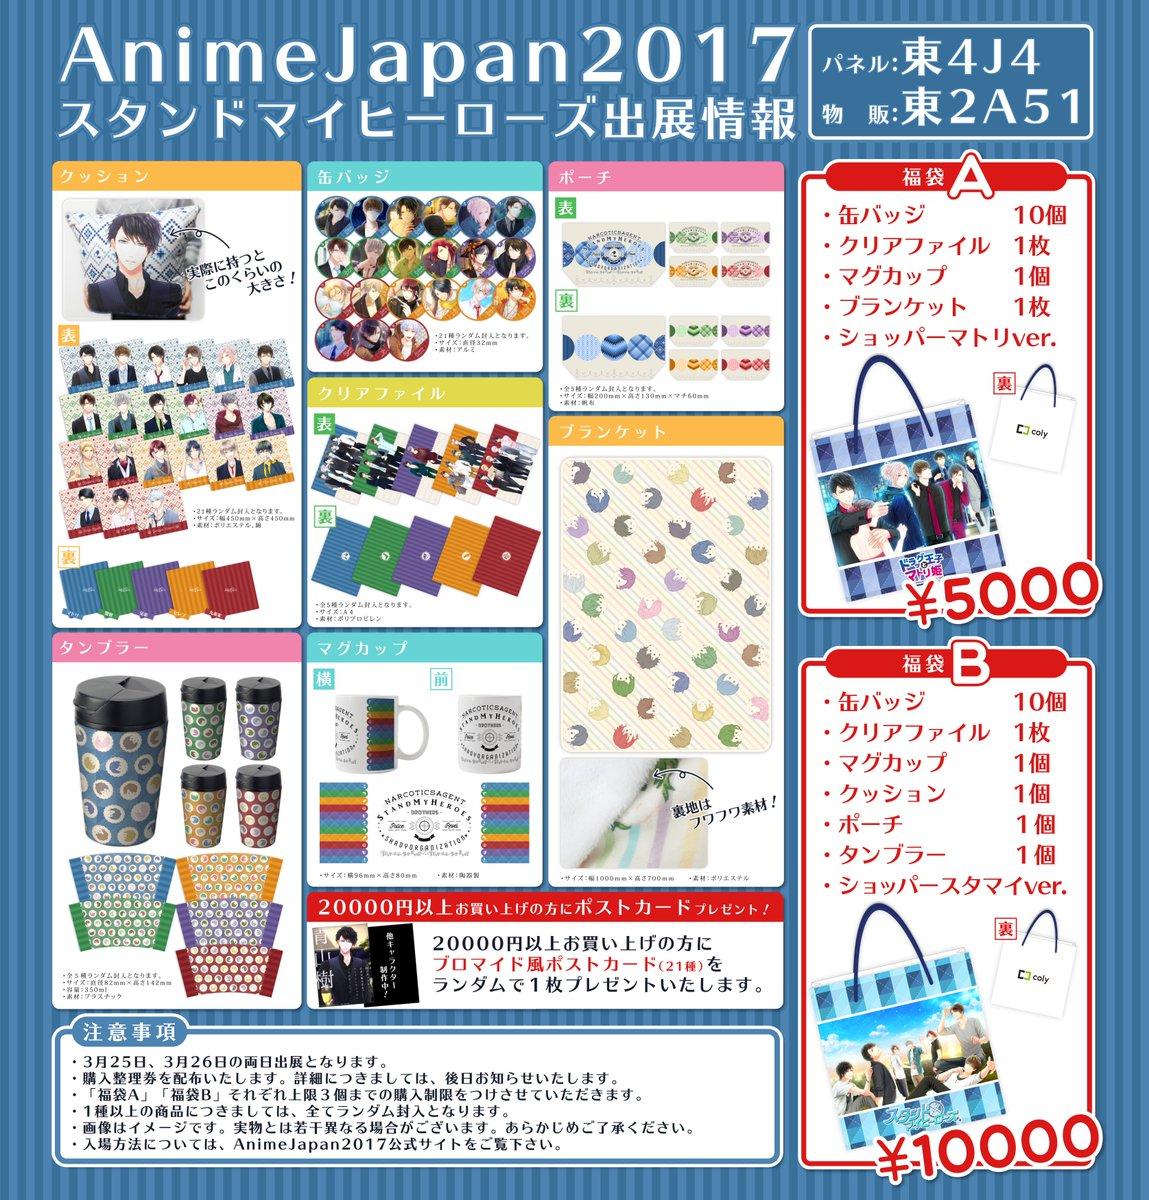 【Anime Japan2017グッズ情報】 Anime Japan2017にてスタマイからは様々な…